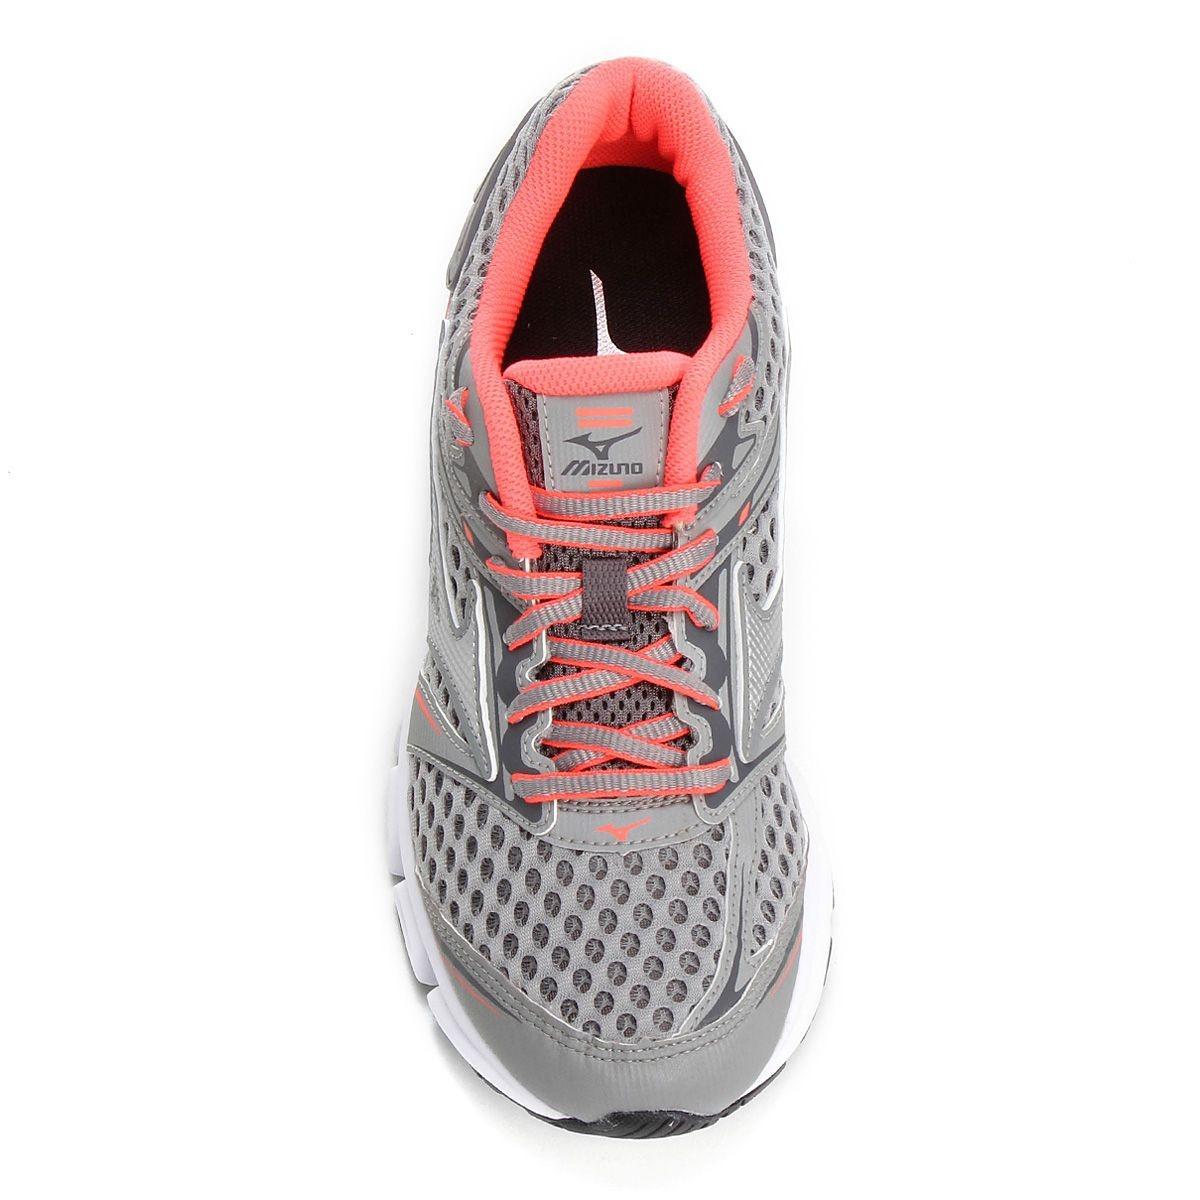 tênis mizuno iron p feminino - grafite e rosa. Carregando zoom. fecc04336ca1d